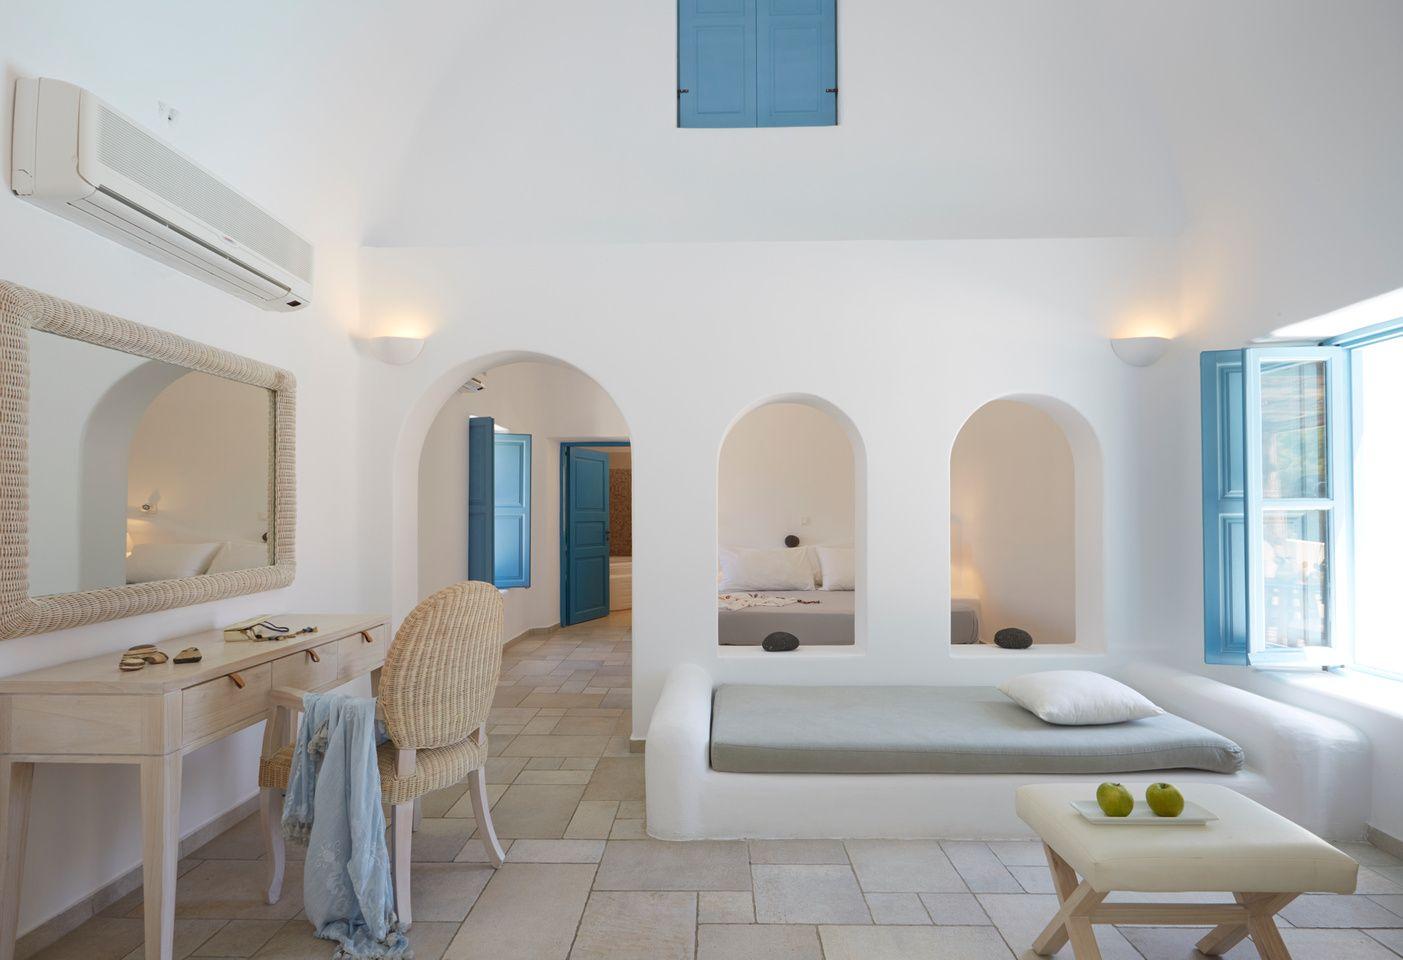 Black rose luxurious suites in santorini hotels pinterest - Decoracion estilo mediterraneo ...